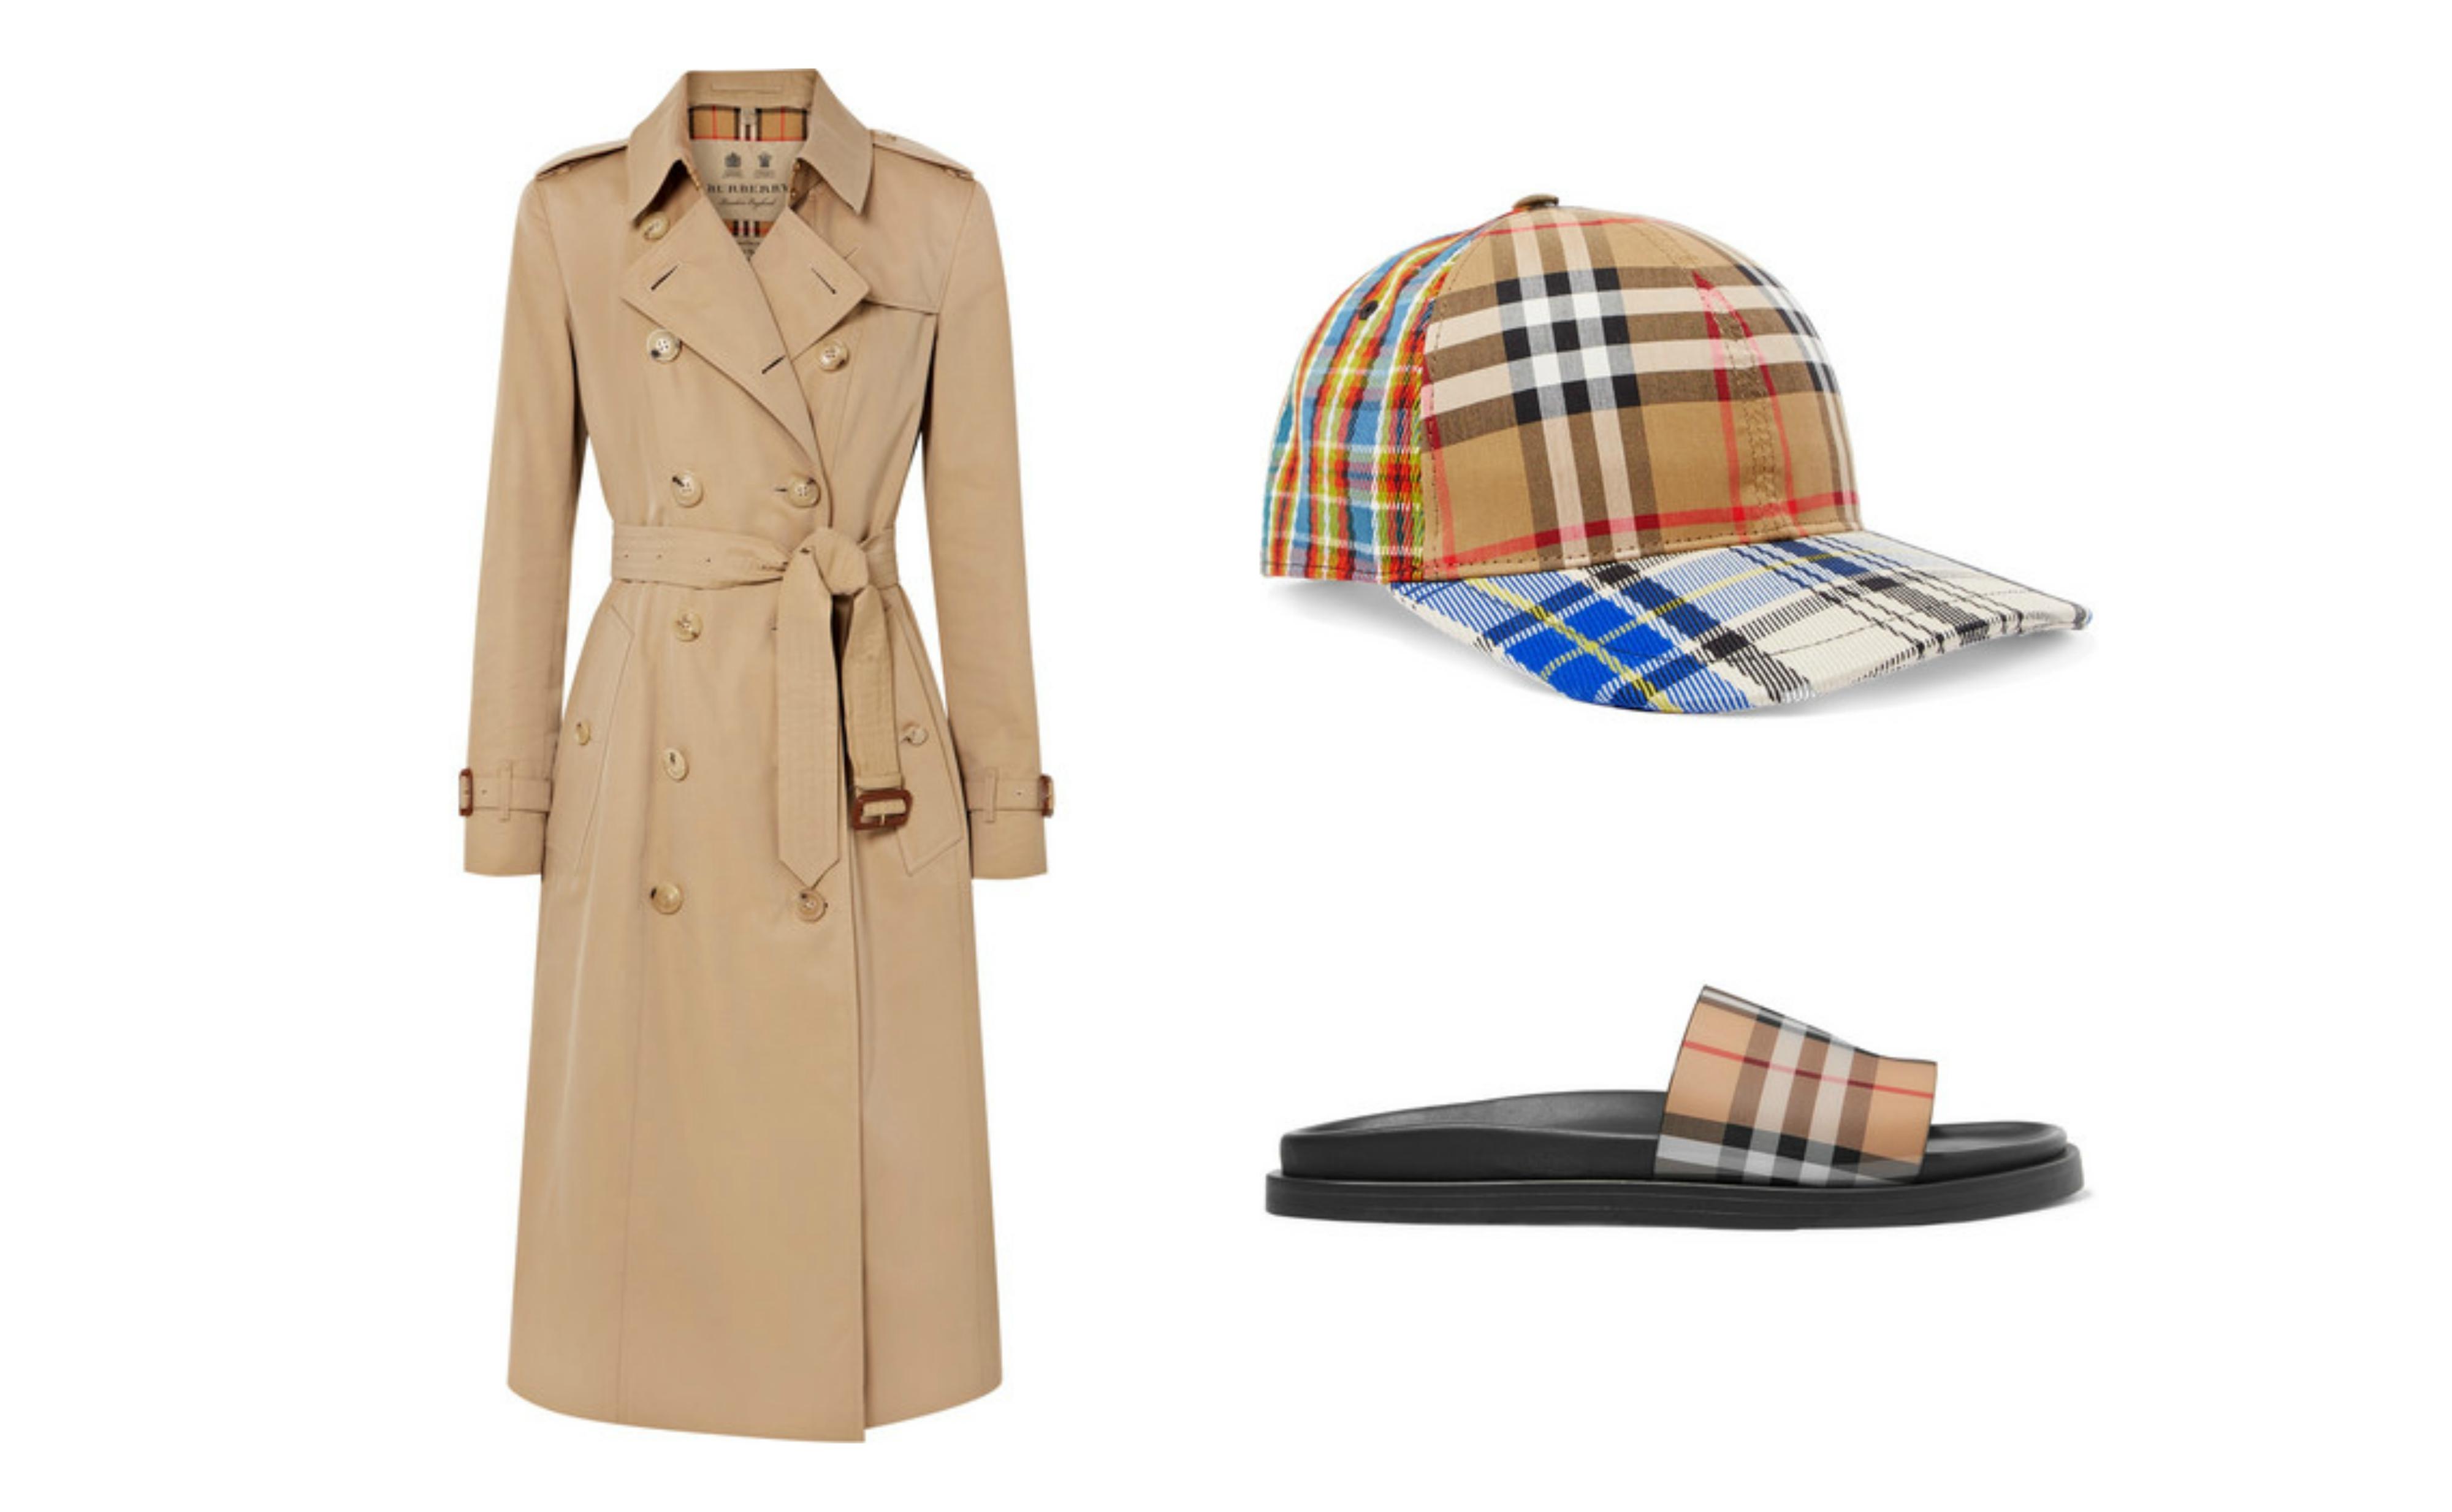 En Burberry-trenchcoat + matchende sandaler og caps